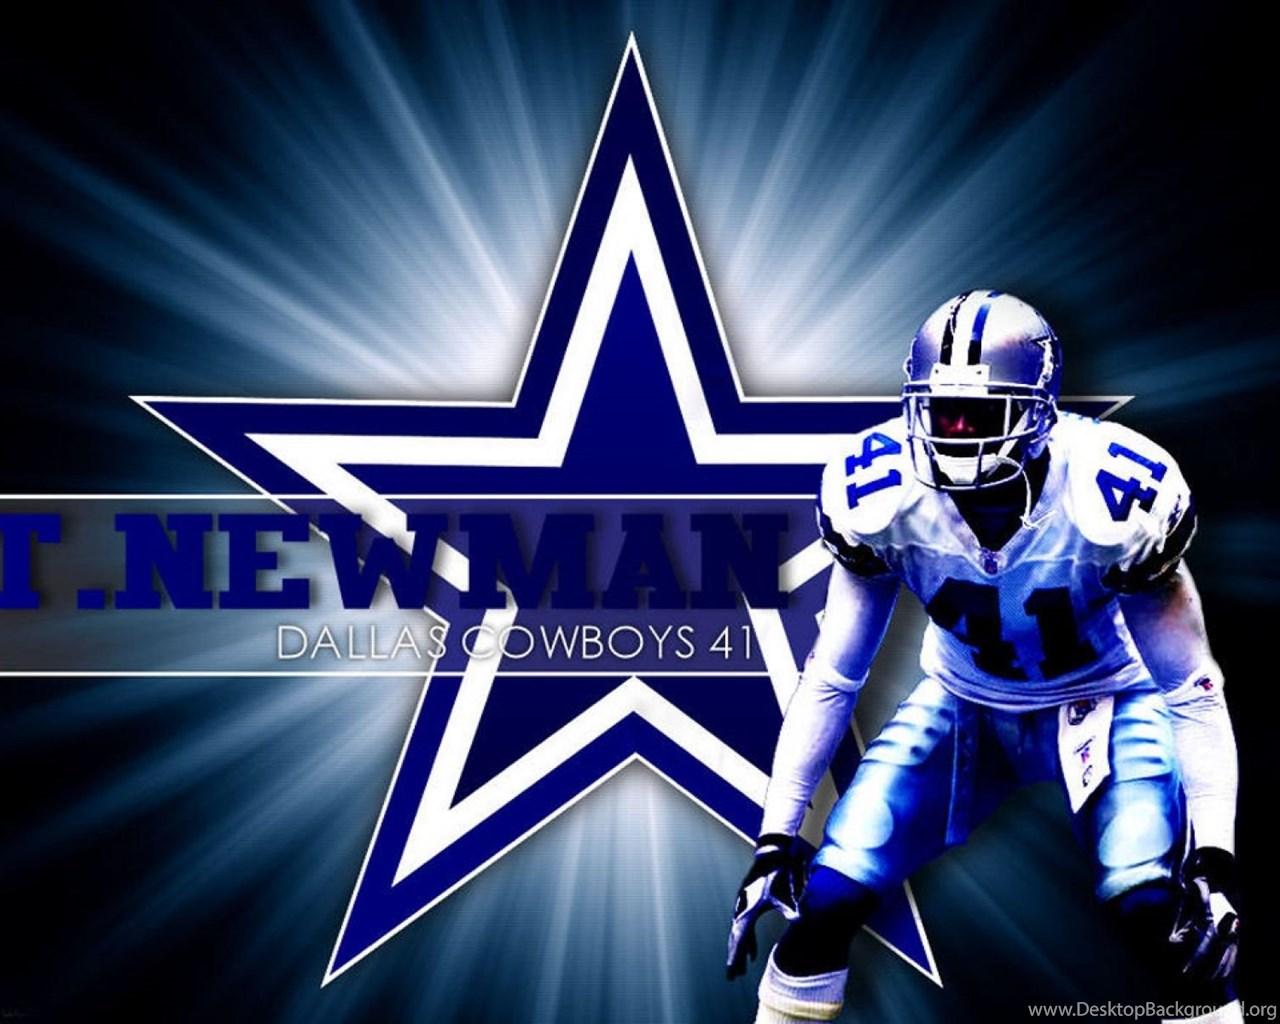 Dallas Cowboys Wallpapers Hd Desktop Background